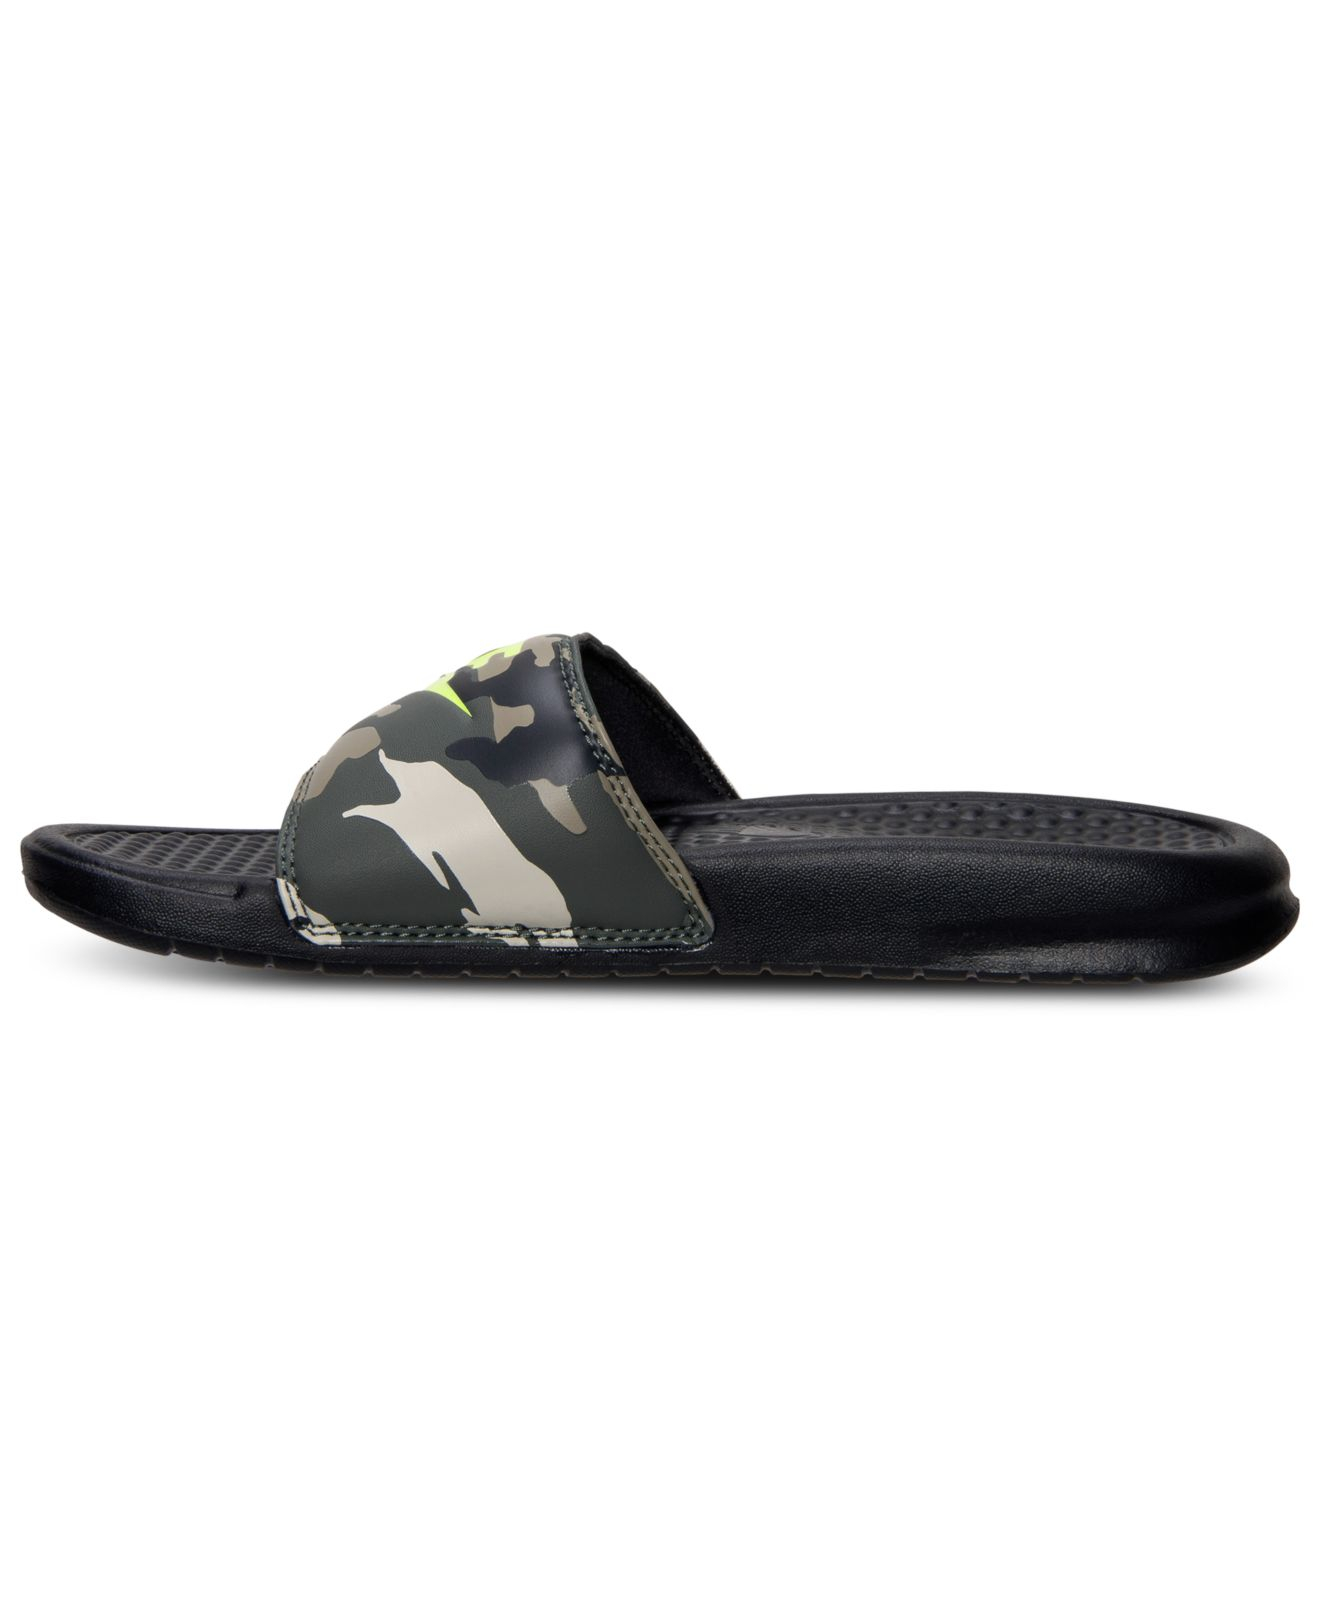 01ff9cdee87b4 Lyst - Nike Men S Benassi Jdi Print Slide Sandals From Finish Line in Brown  for Men